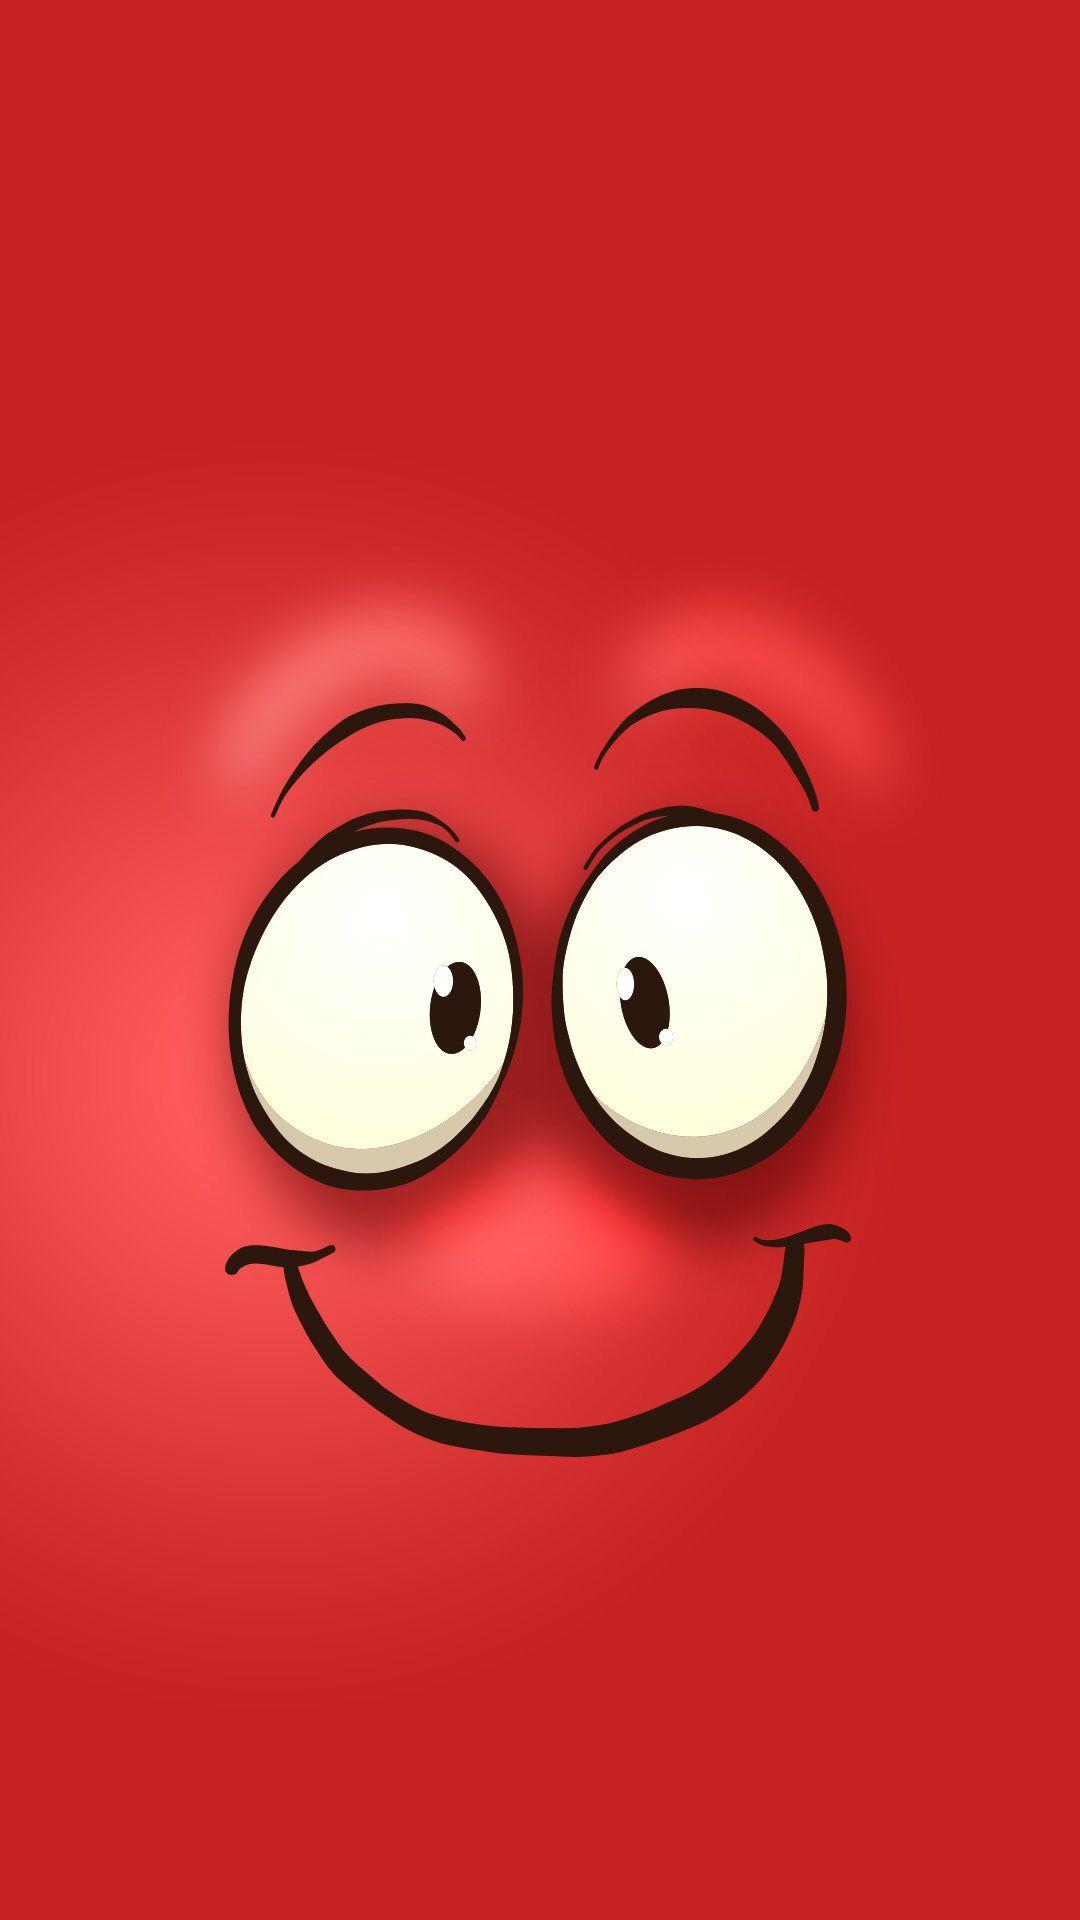 Cool Wallpaper, Funny Iphone Wallpaper, Emoji Wallpaper, - Schönen Tag Noch , HD Wallpaper & Backgrounds